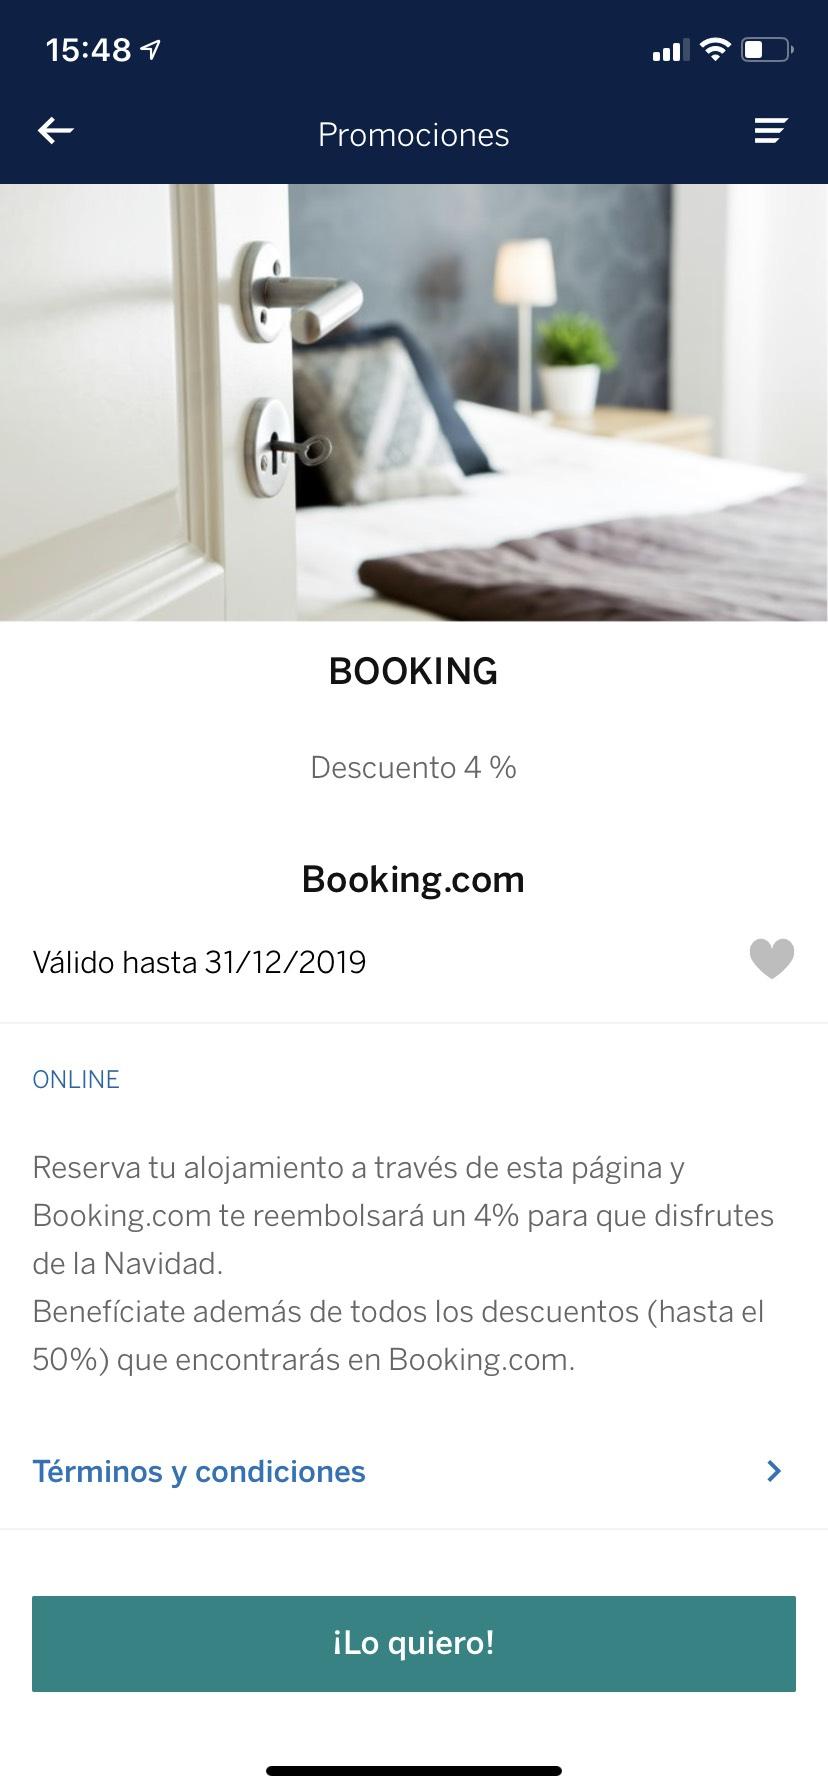 Reembolso booking.com de un 4% en reservas